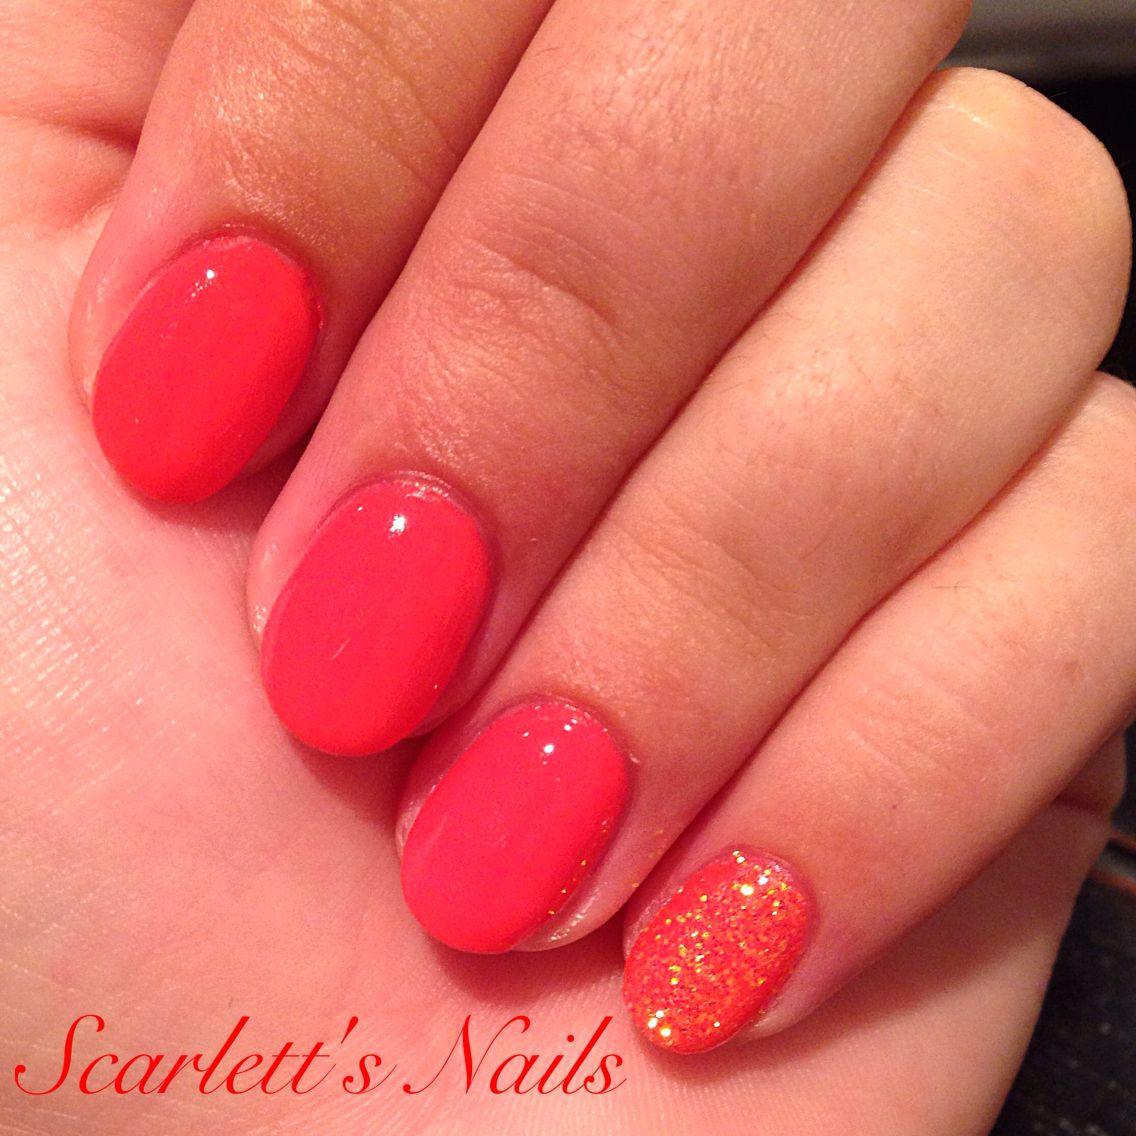 CND Tropix coral glitter simple summer shellac nails #scarlettsnails ...